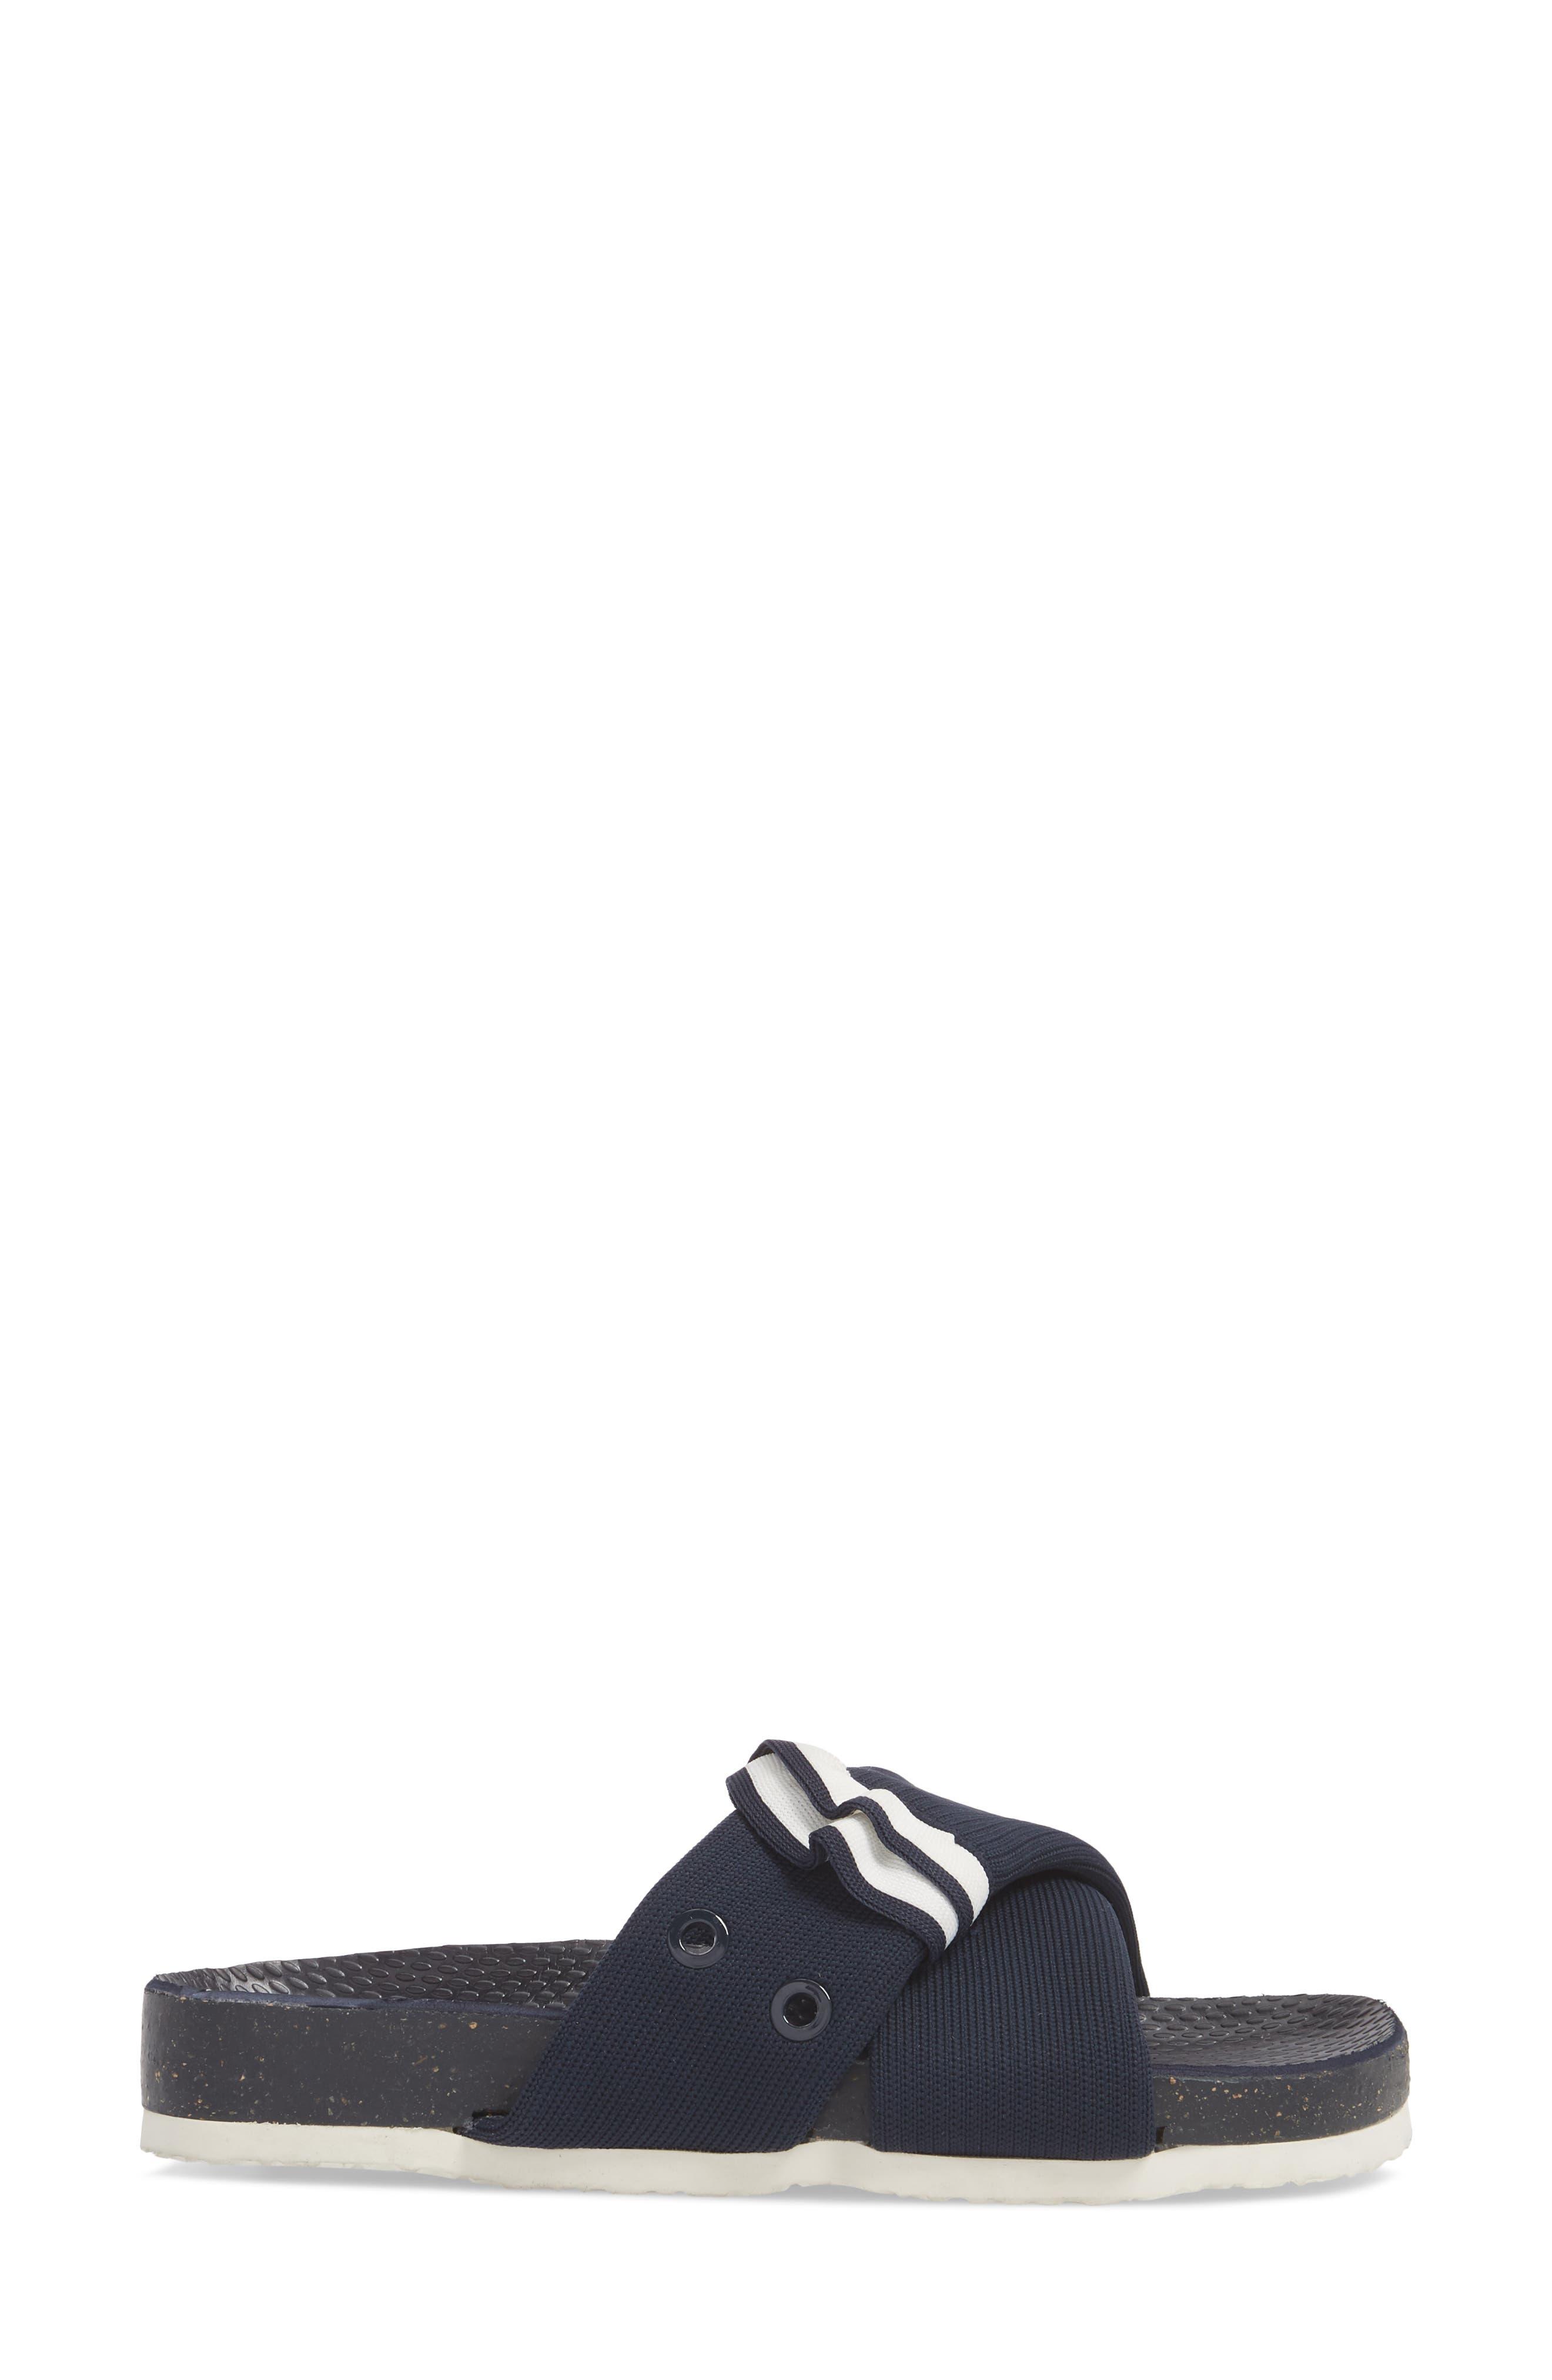 Sidecar Ruffle Slide,                             Alternate thumbnail 3, color,                             Bright Navy/ Show White